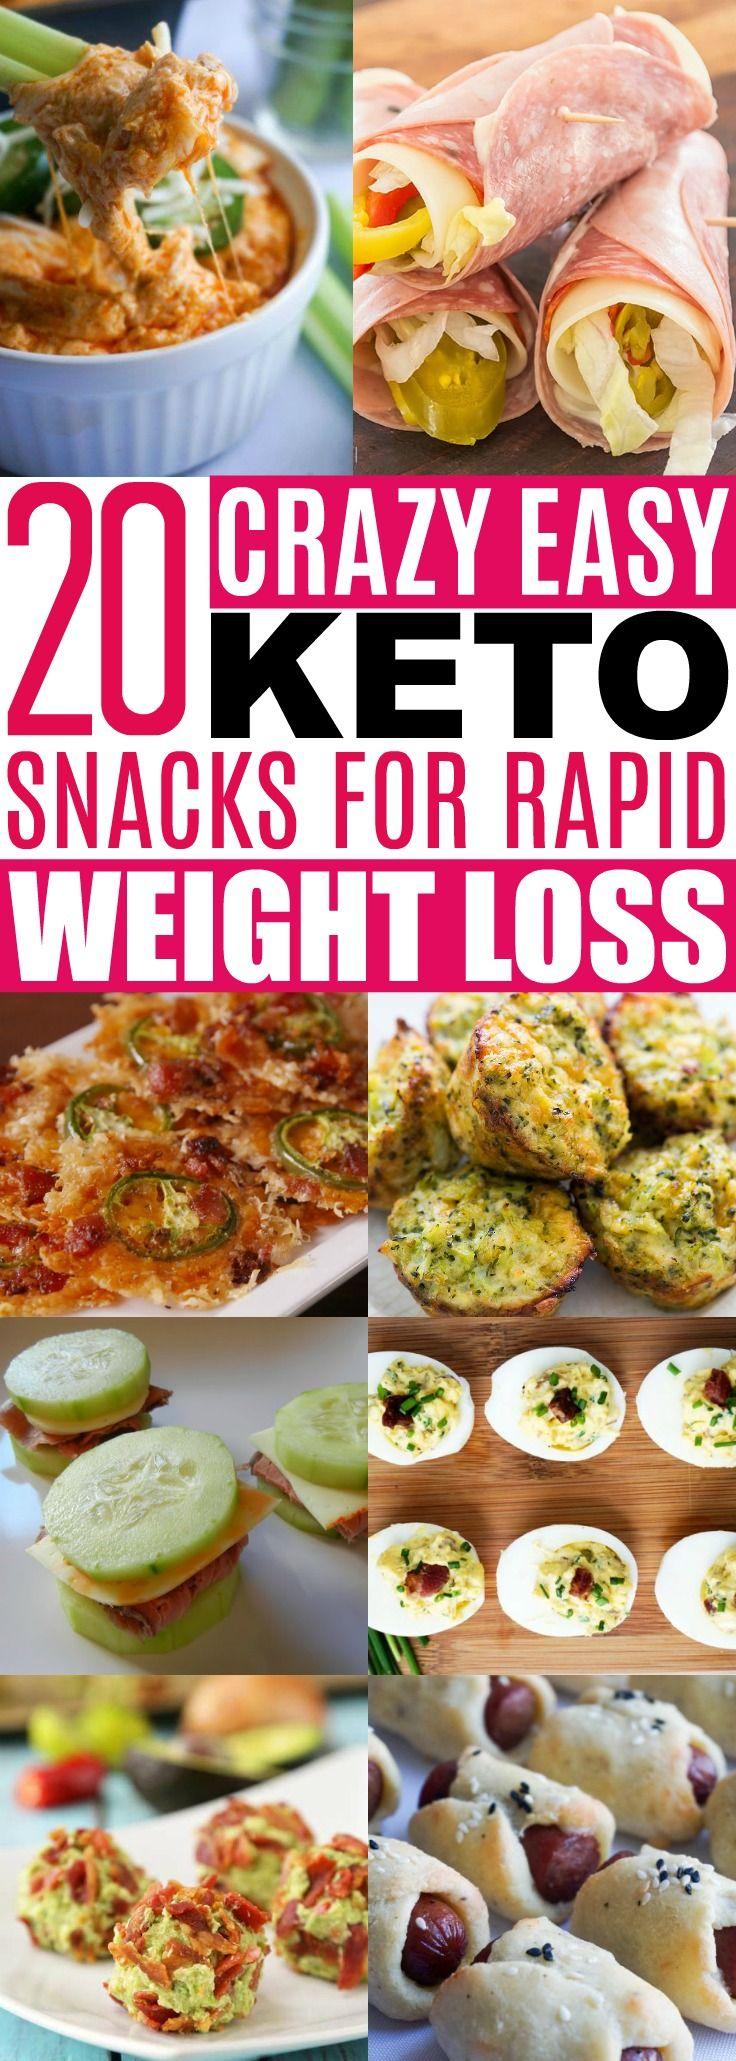 20 keto snacks that 39 ll help you lose weight sport pinterest di ten abnehmen und essen. Black Bedroom Furniture Sets. Home Design Ideas